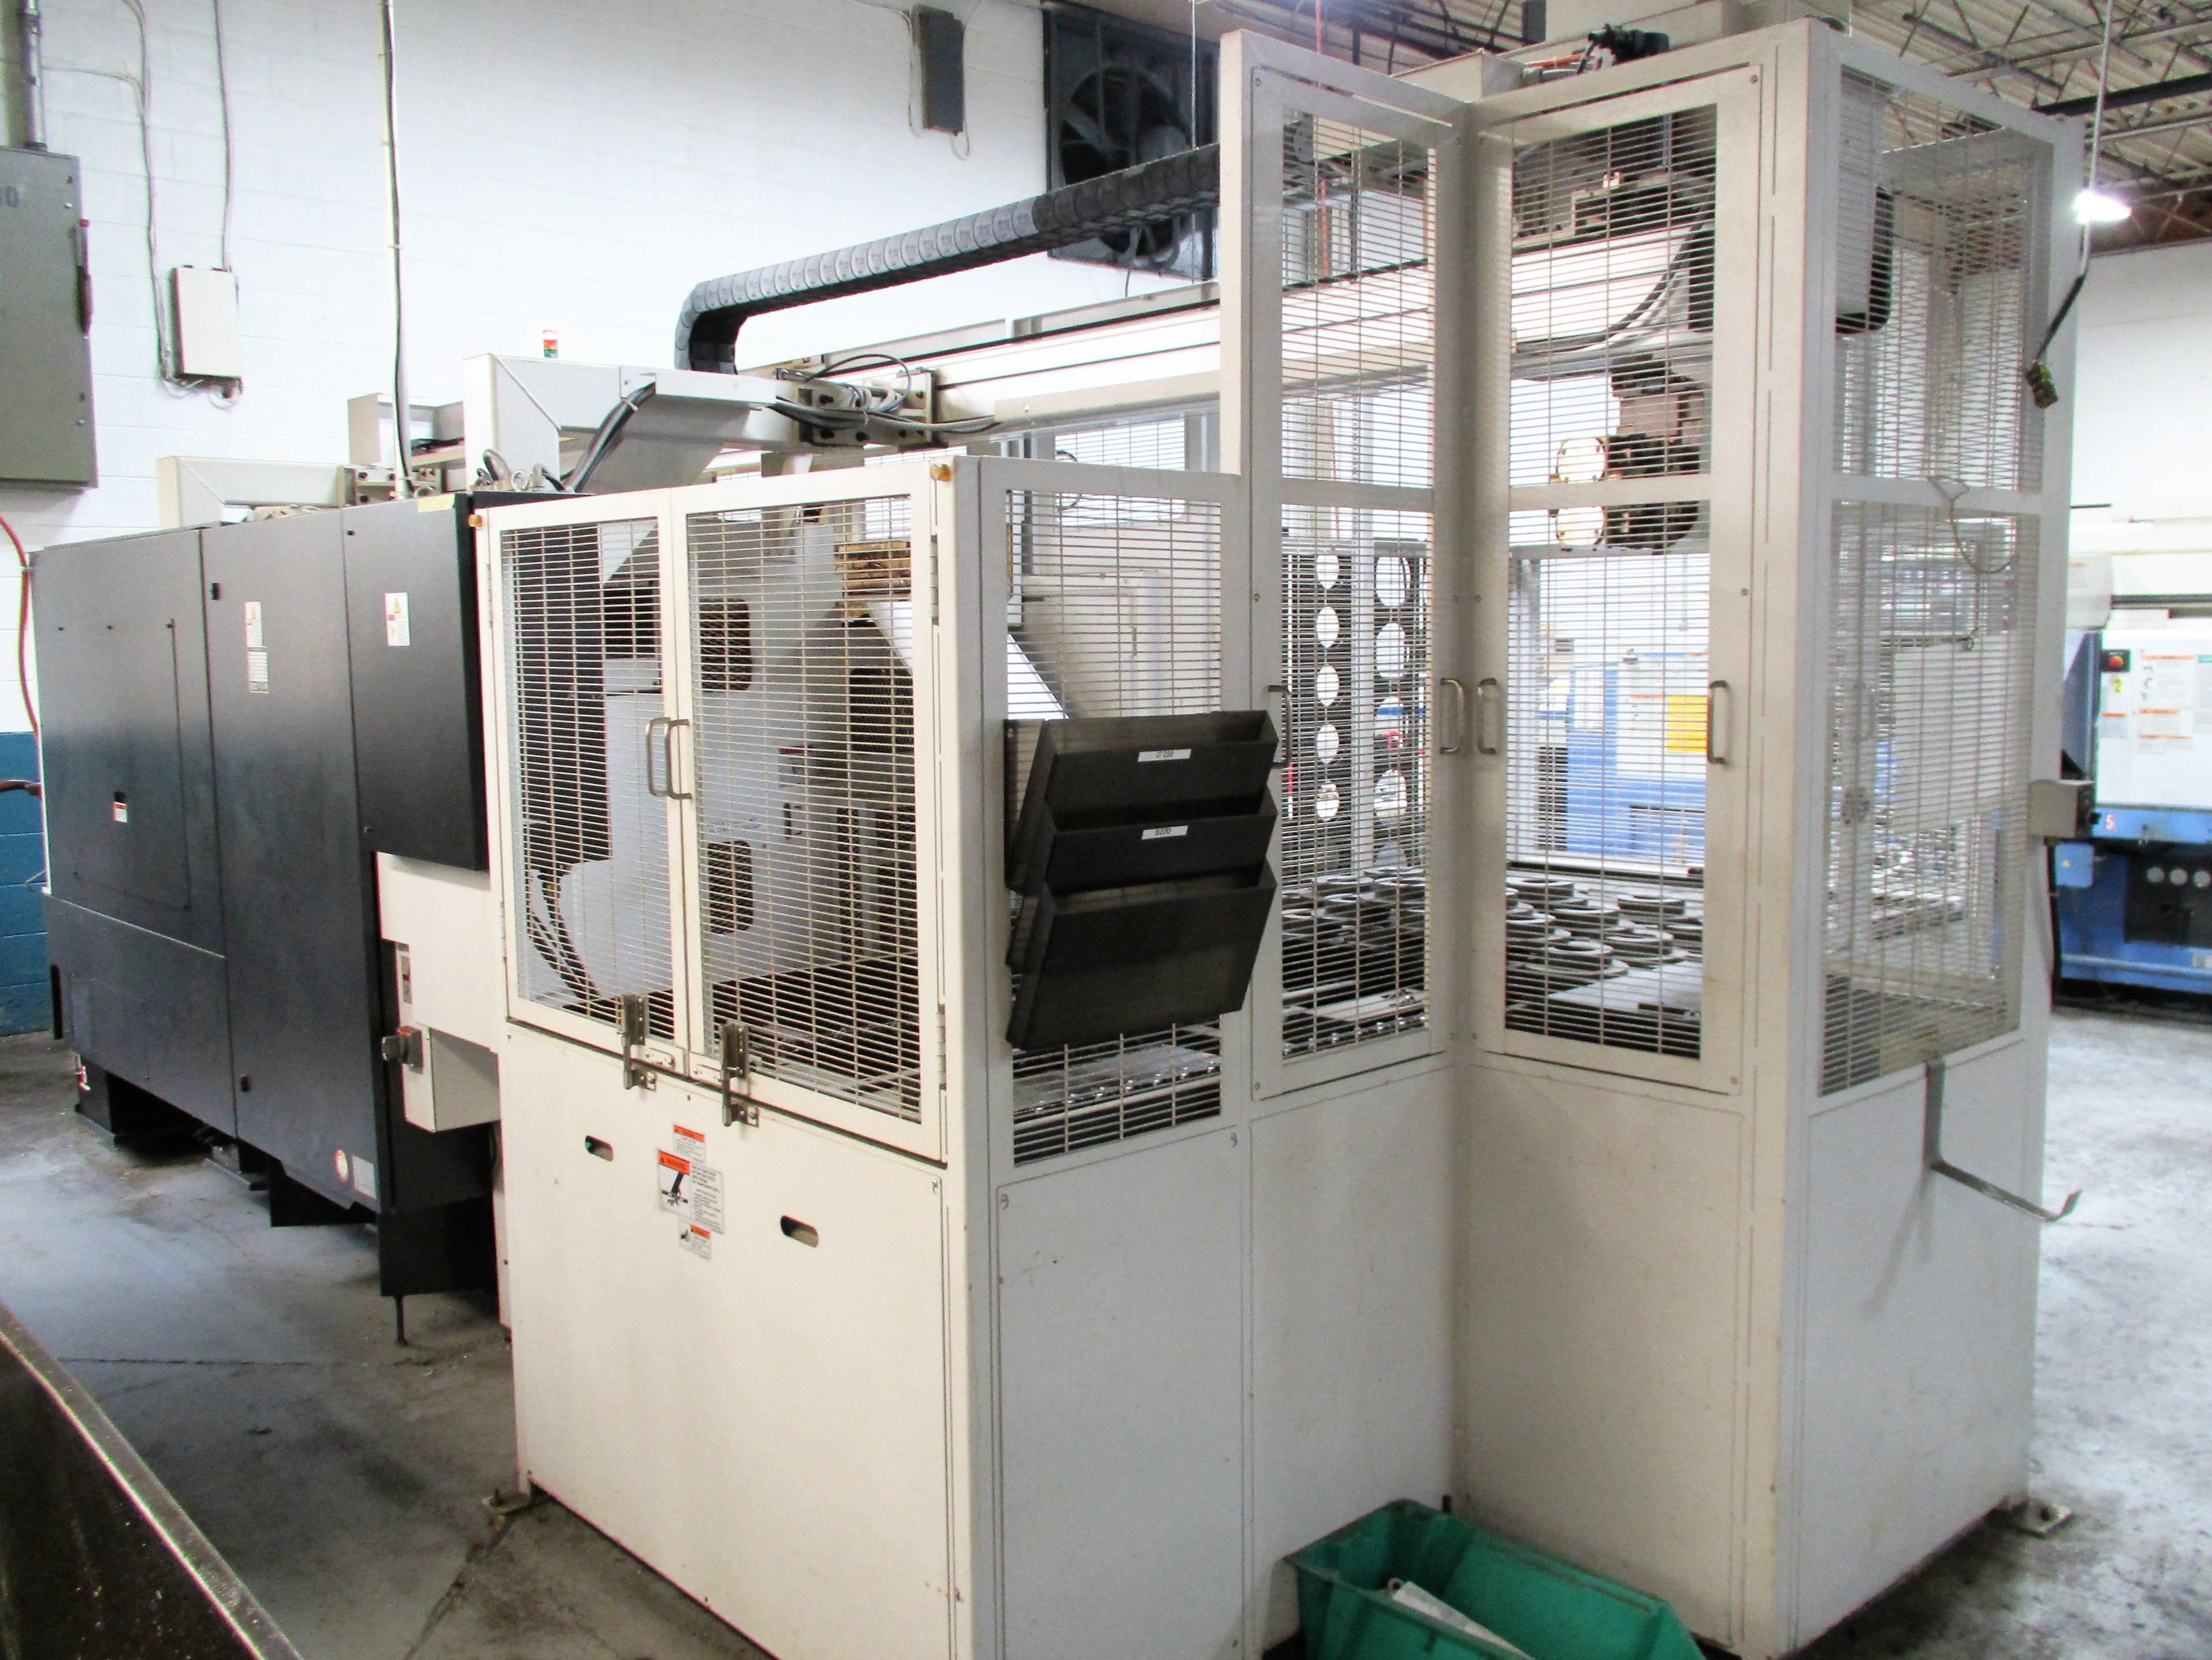 MAZAK QUICK TURN NEXUS 250-II MSY CNC TURNING CENTER - Image 14 of 16